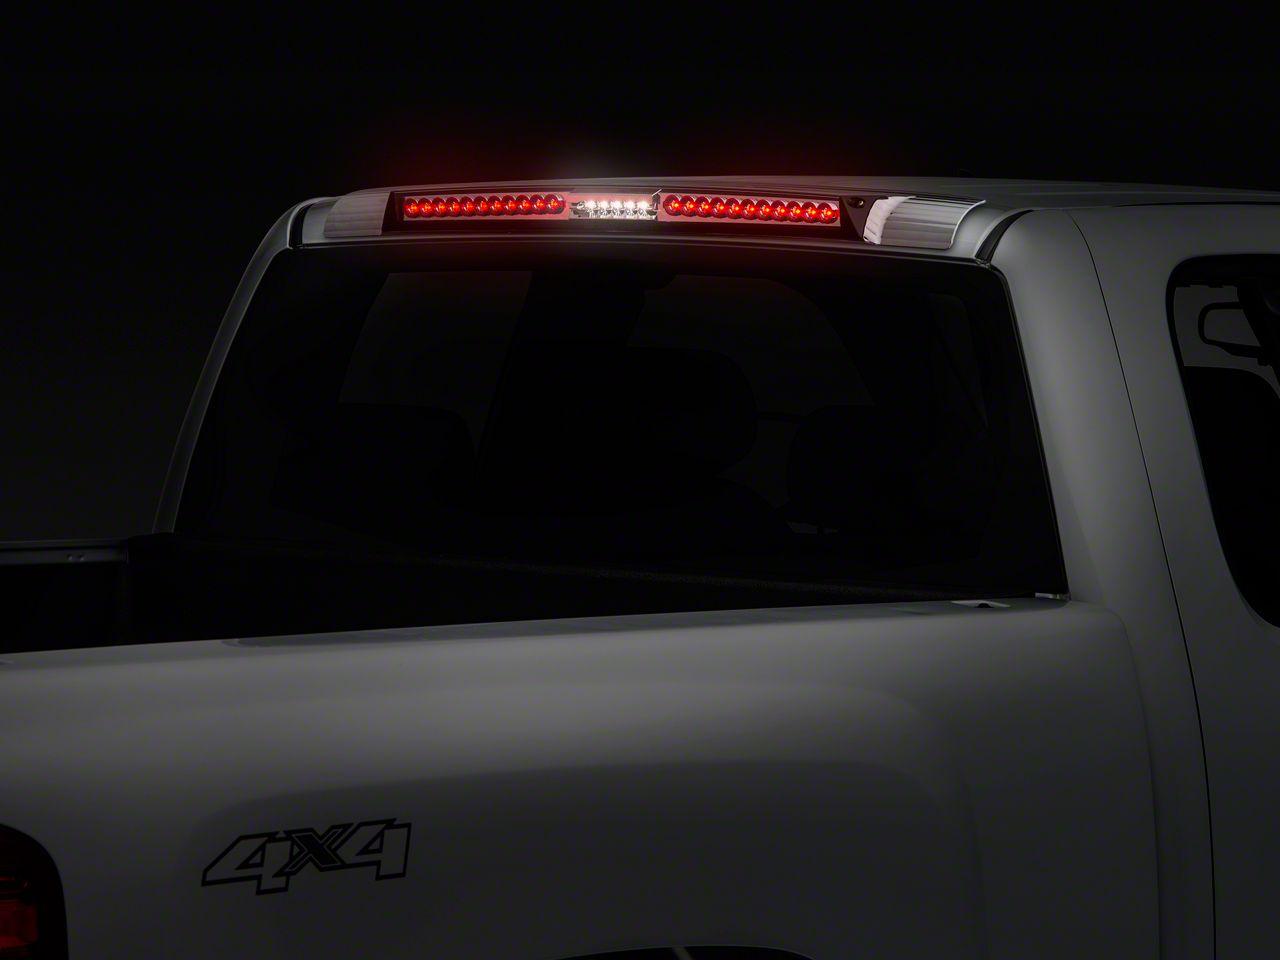 Alteon MEGA Crystal Clear LED Third Brake Light w/ Red Trim (07-13 Silverado 1500)